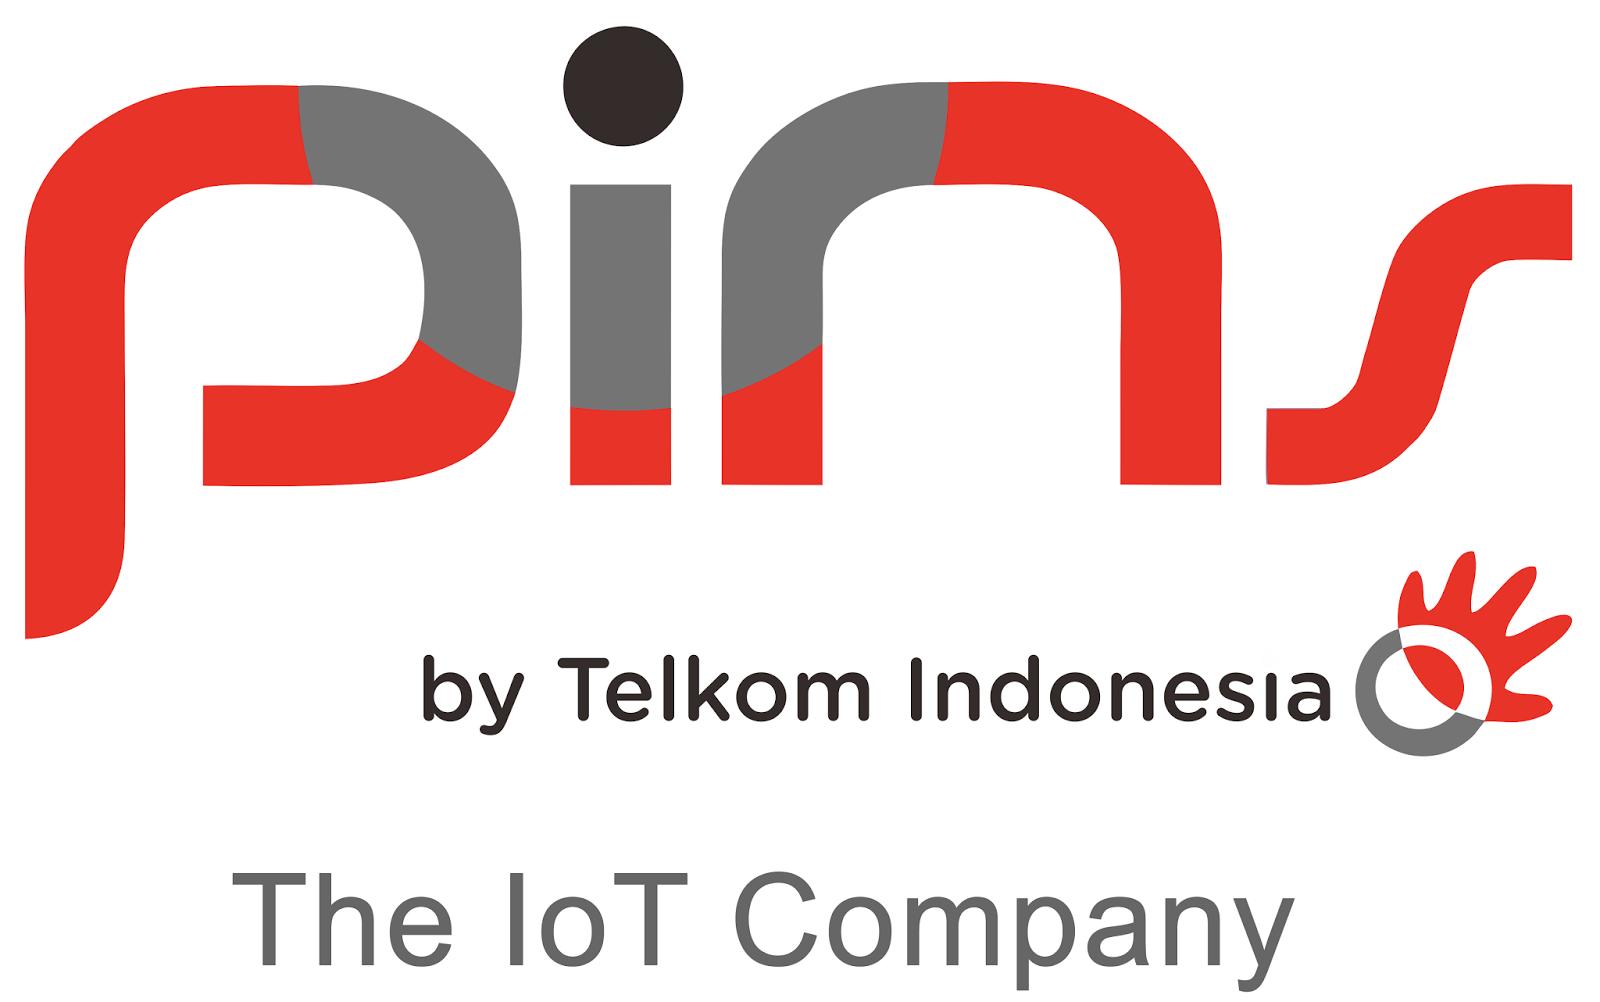 PT PINS Indonesia - Alamat, No Telp, Email Perusahaan